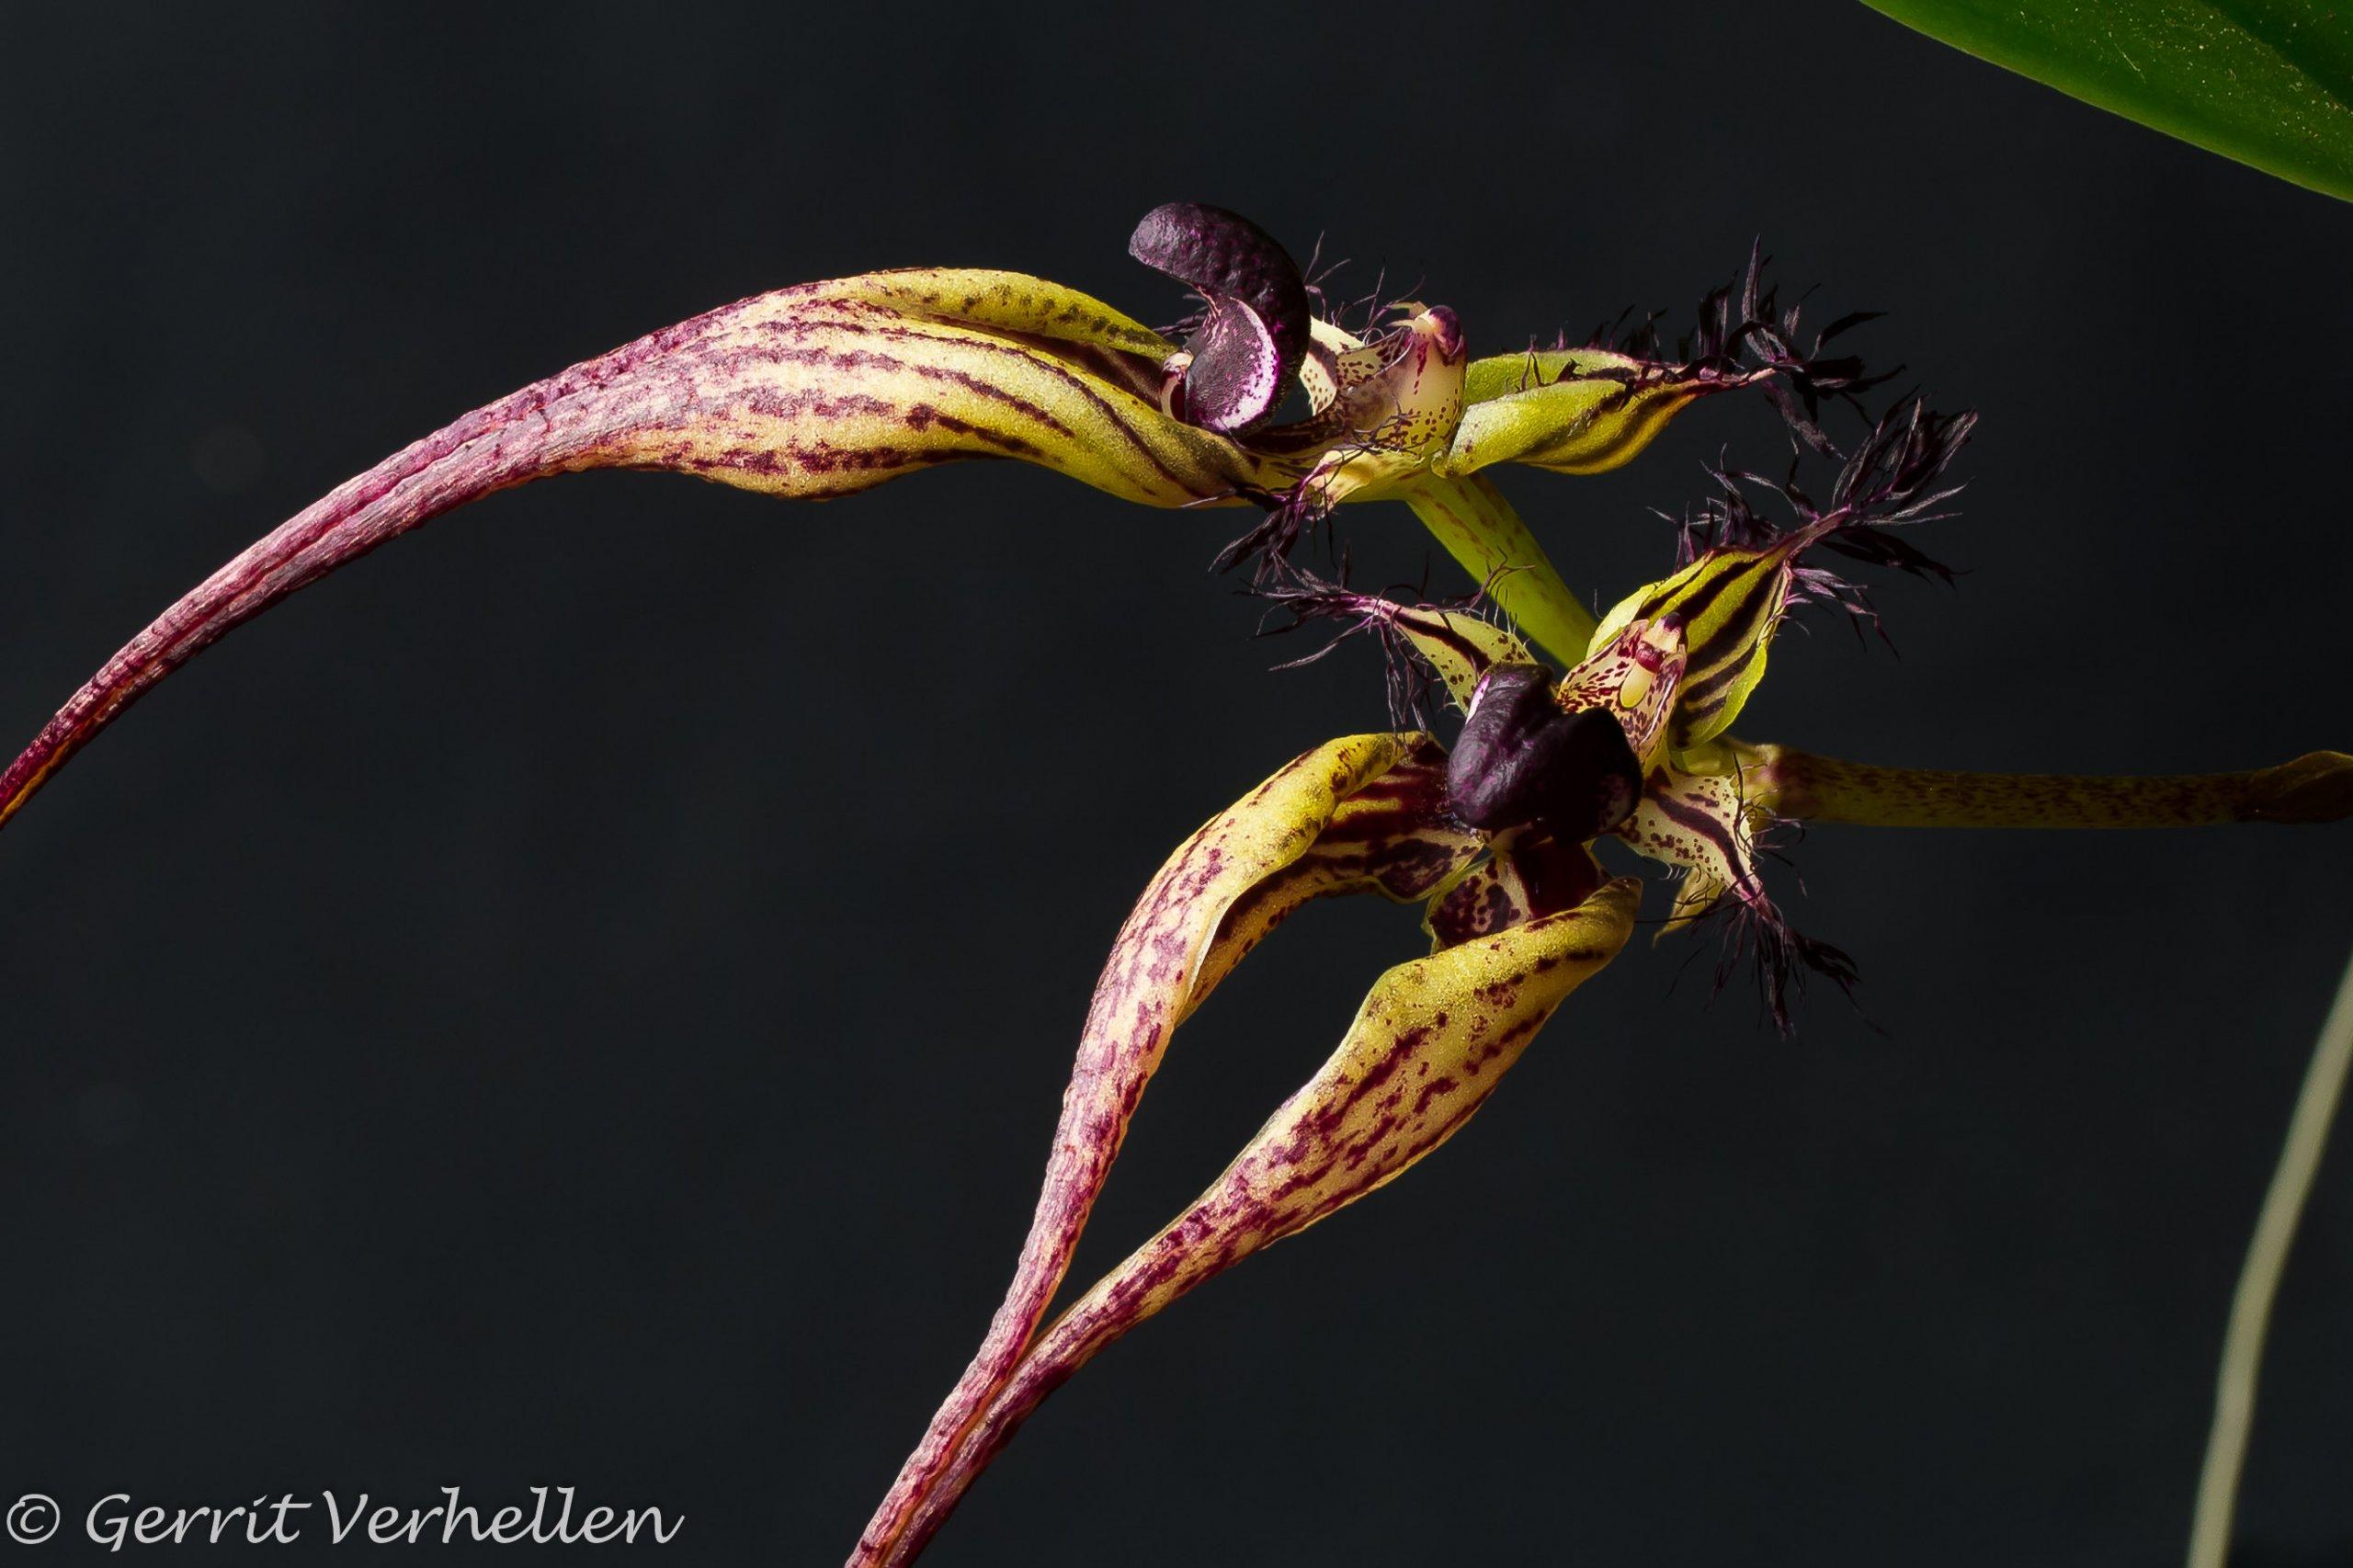 Bulbophyllum-181221-.jpg